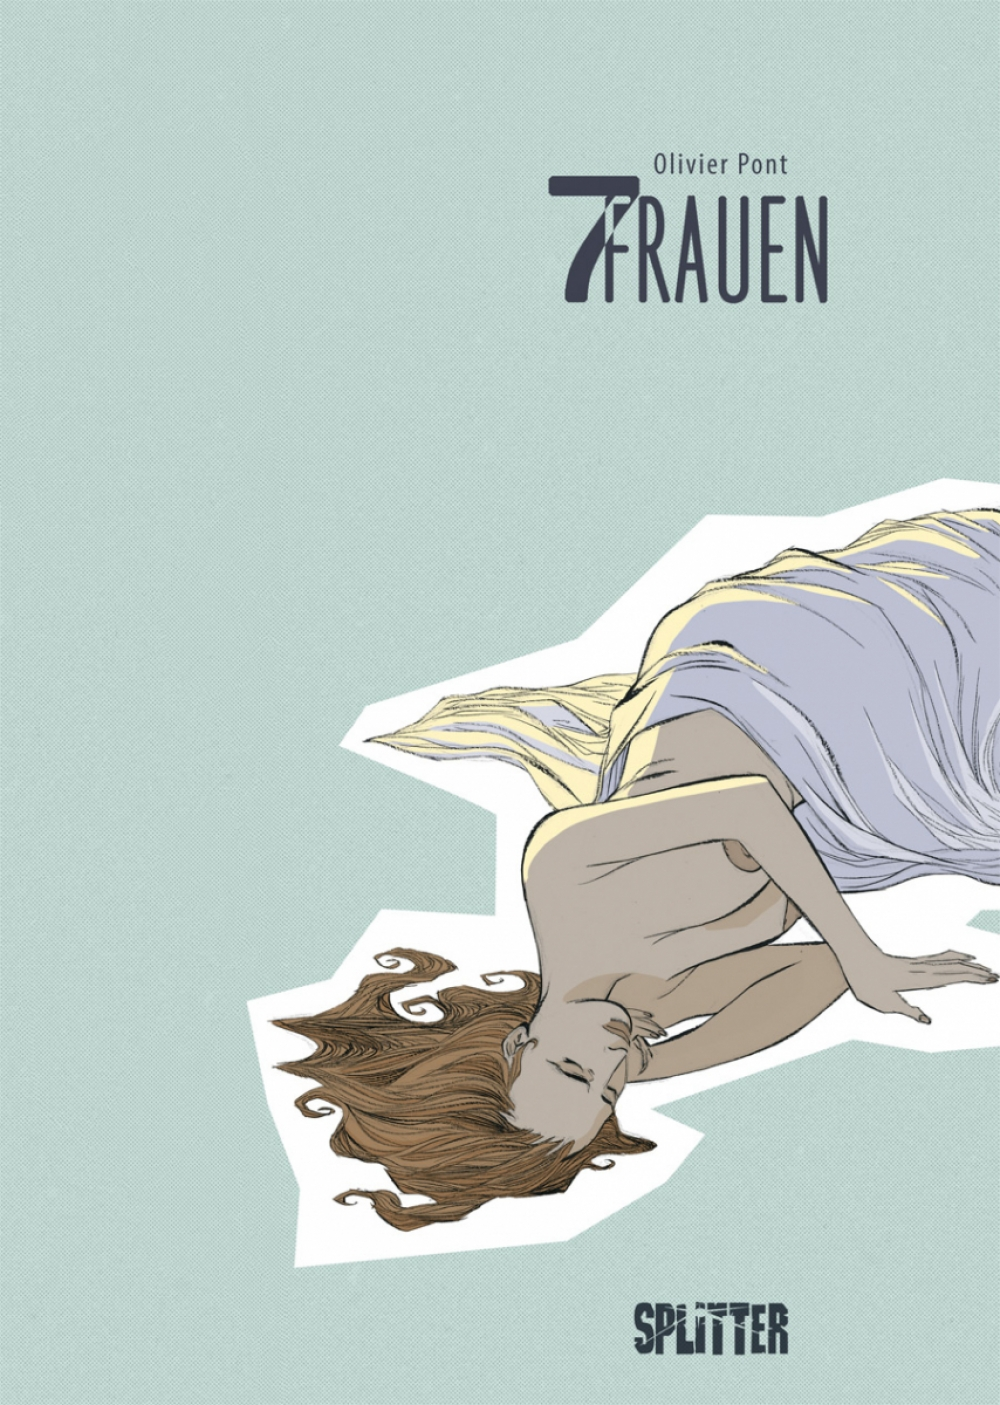 Bilderbox Vienna - comic